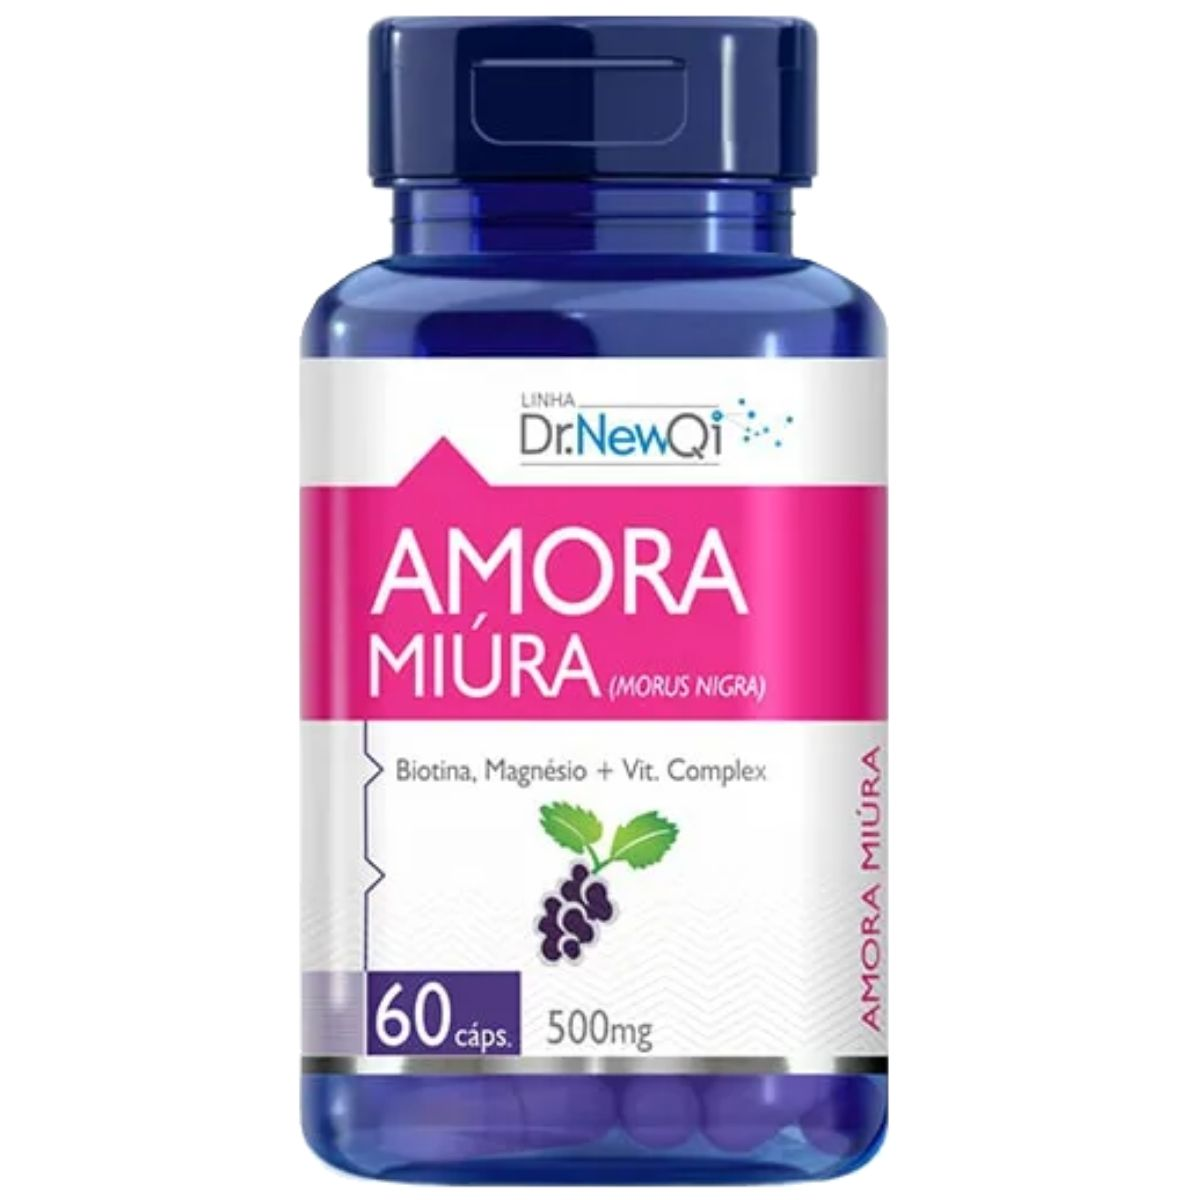 Amora Miúra C/ Vitaminas e Mineral 60 Cápsulas 500mg Dr. Lair/New QI - Upnutri